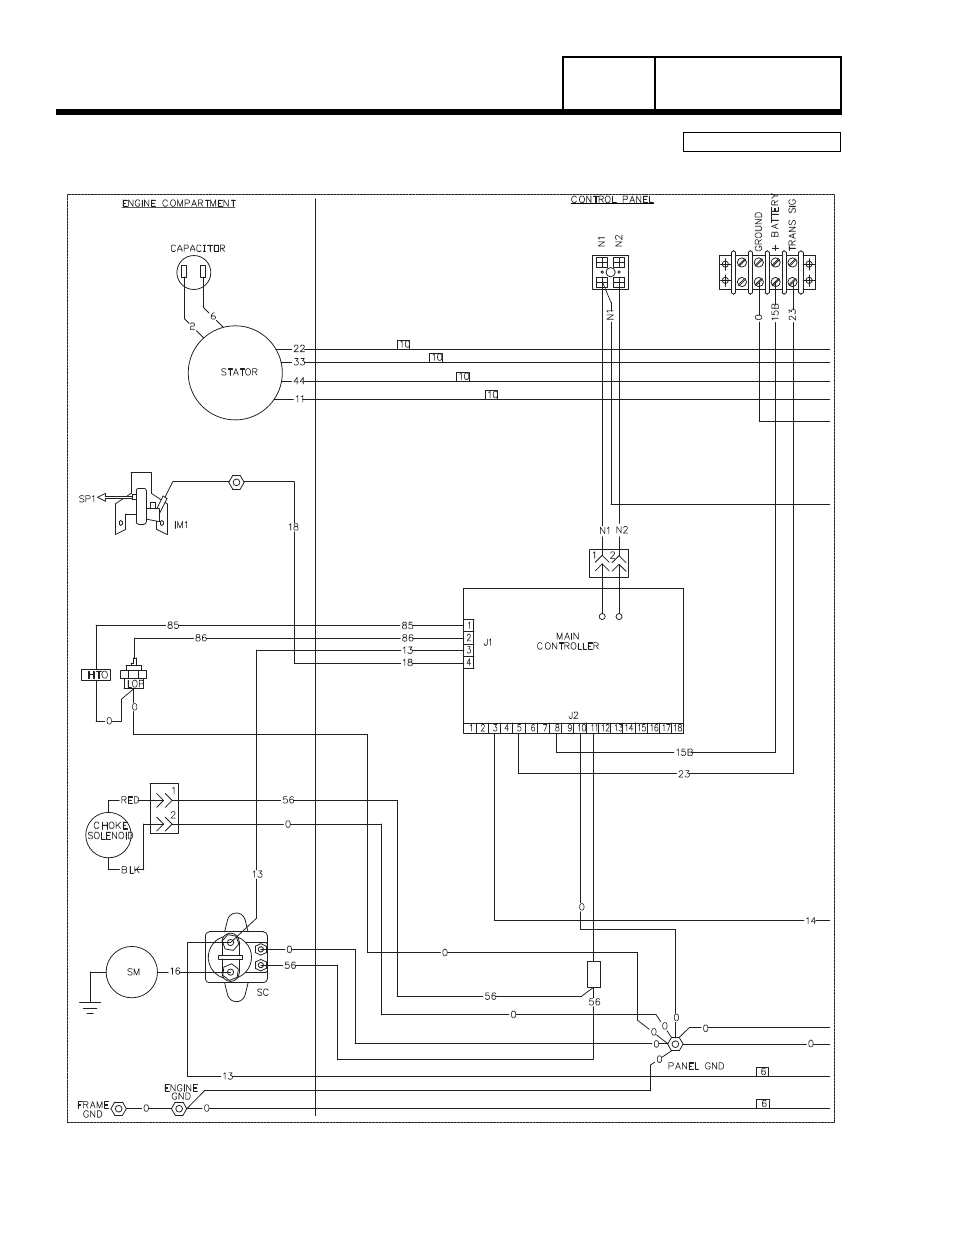 Jvc Kw-V250Bt Wiring Harness Diagram from lh6.googleusercontent.com